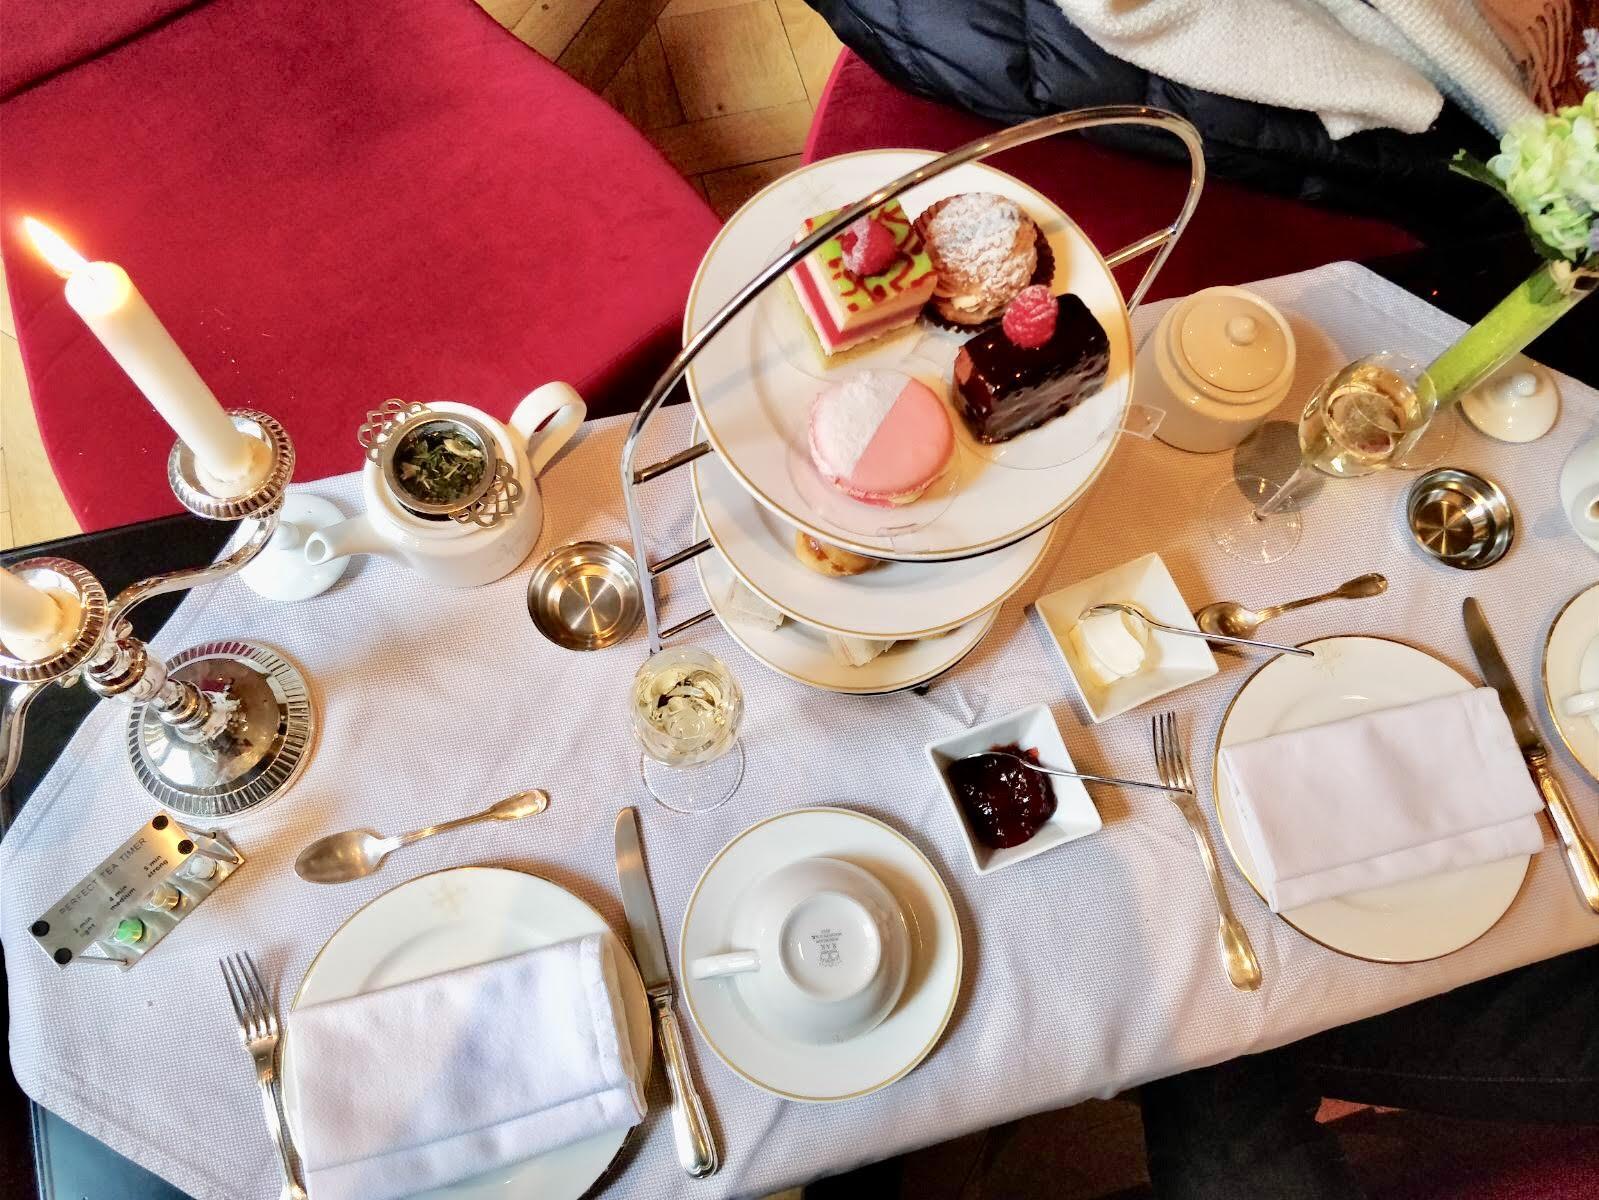 blog-mode-beaute-lifestyle-deco-recette-cuisine-strasbourg-cityguide-restaurant